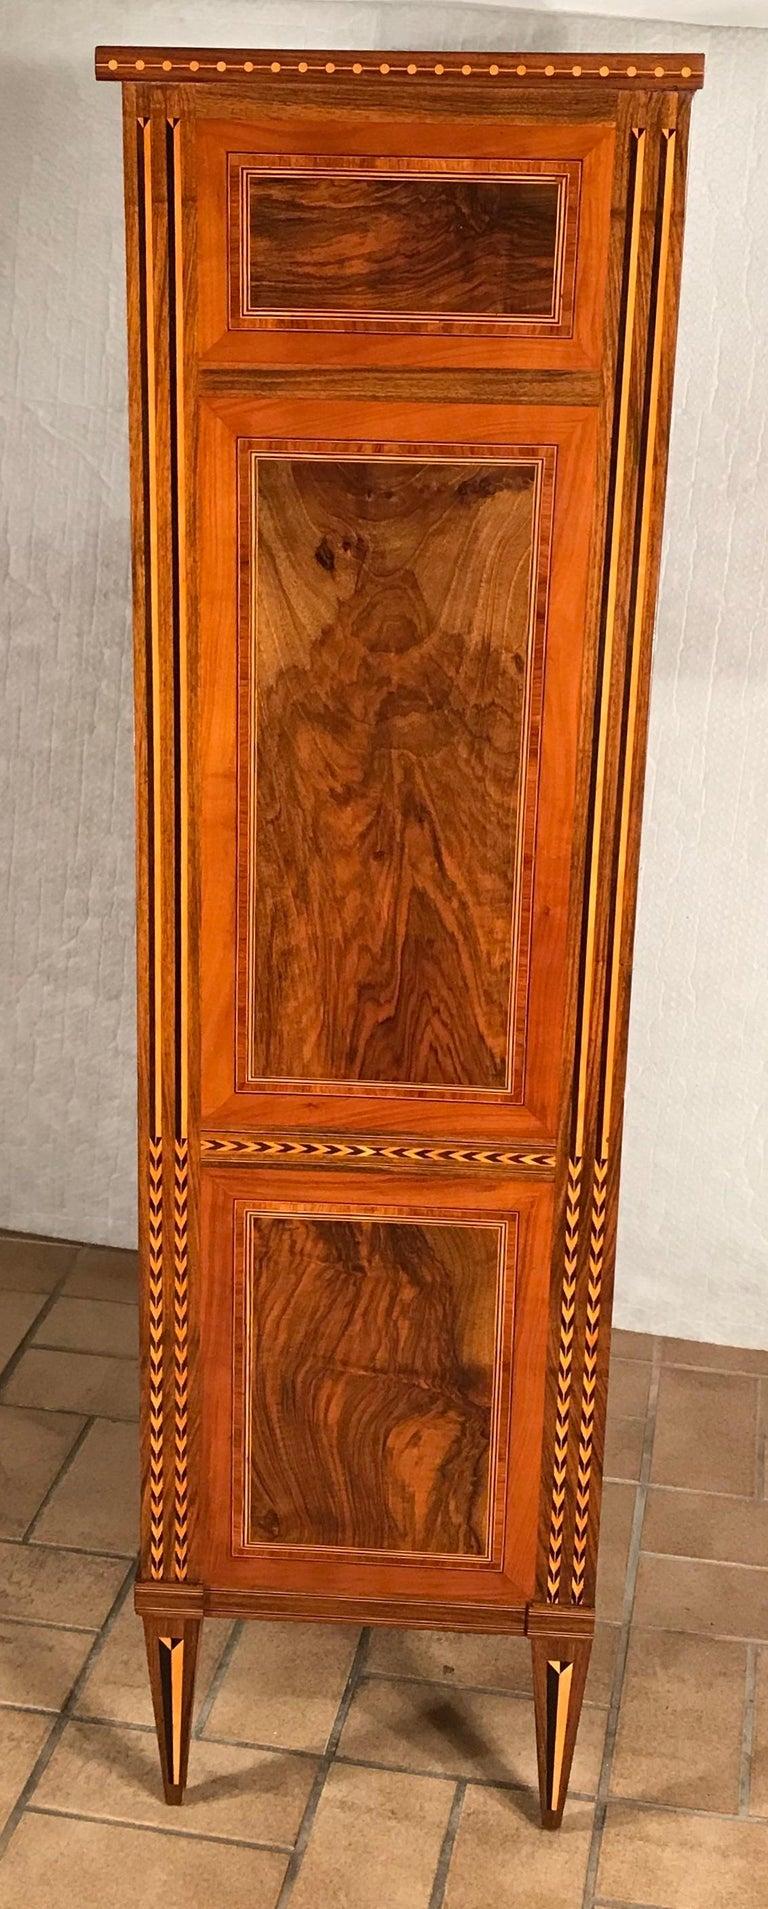 Louis XVI Drop Front Desk, France 1780-1800, Walnut Root Veneer For Sale 5